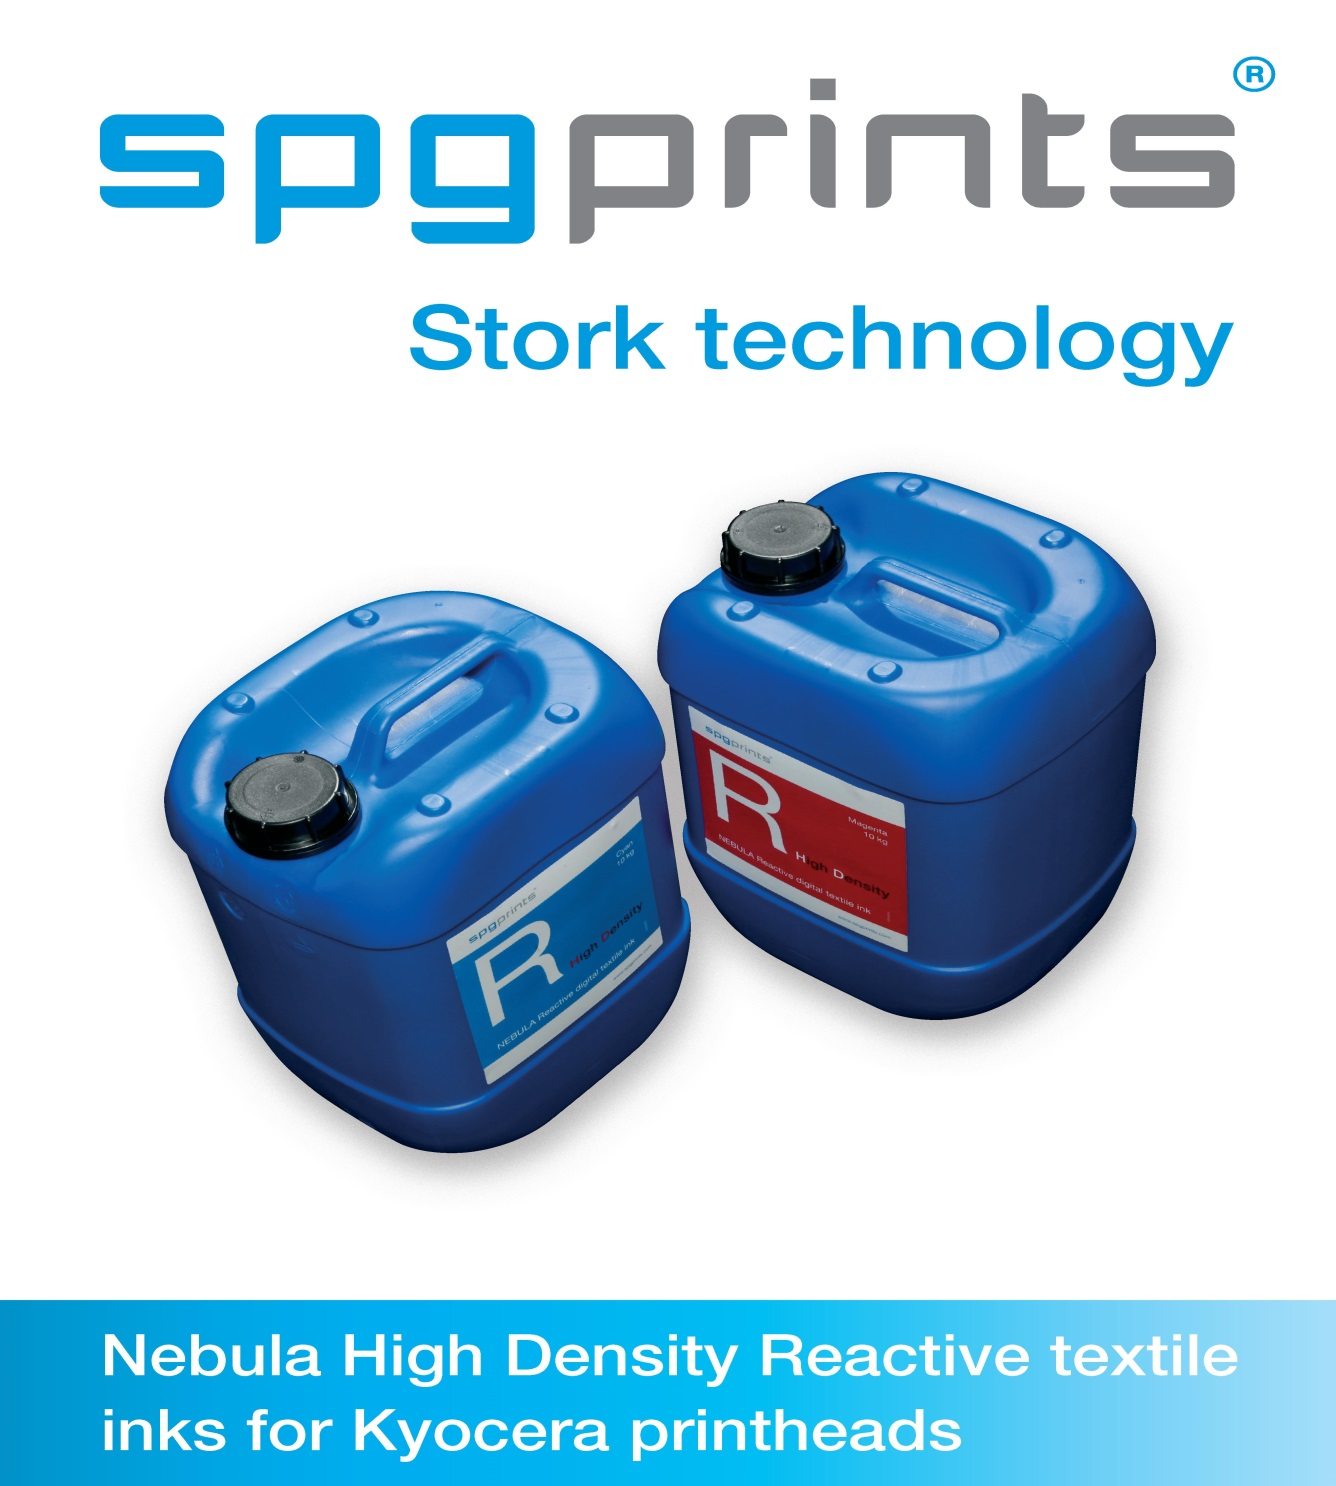 Competitive Pricing: Benevolent Textile Services